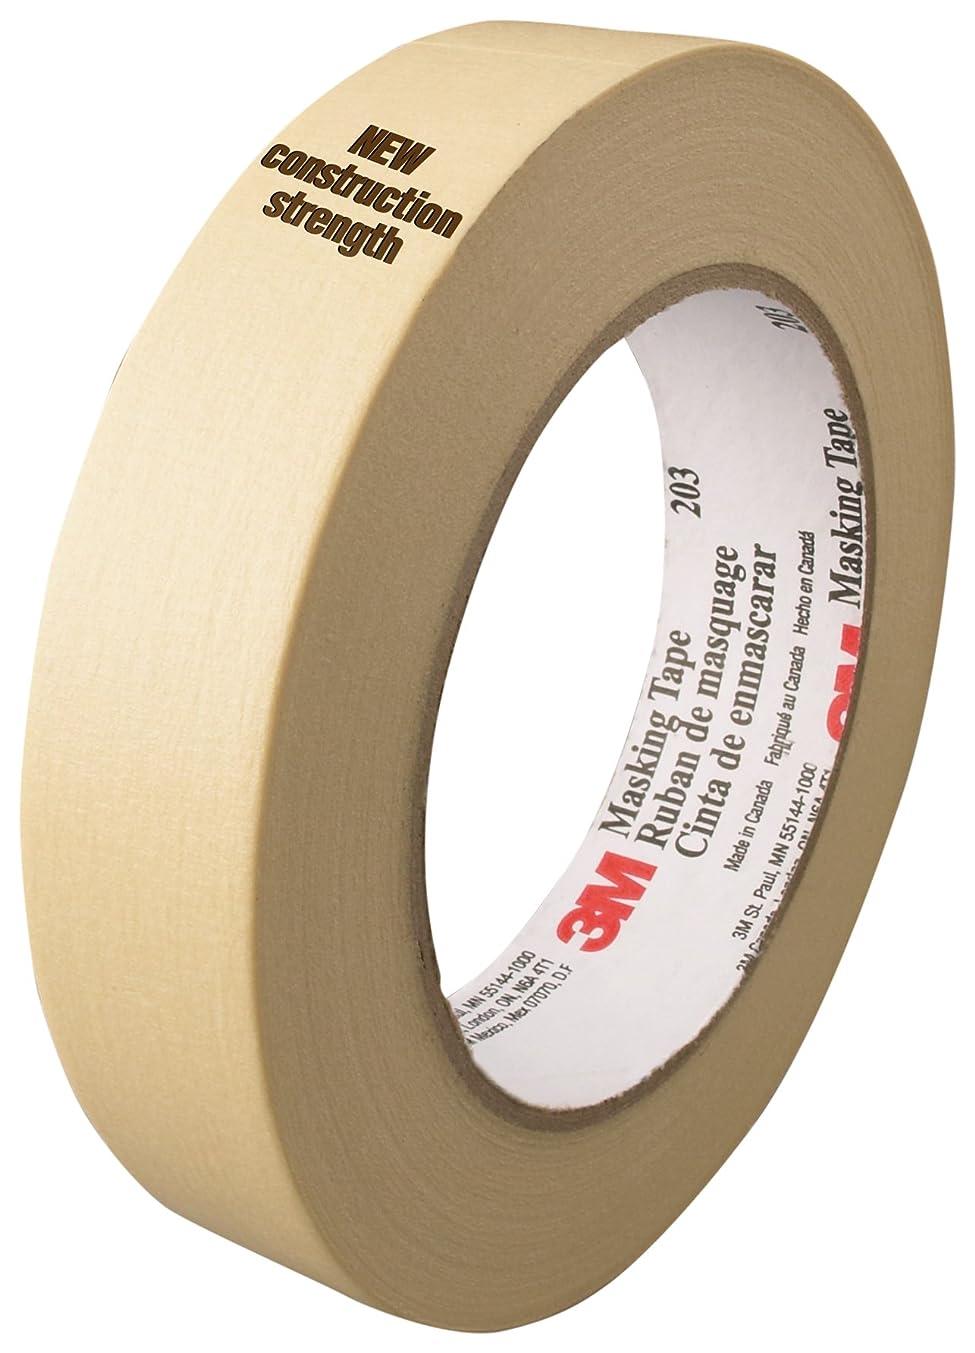 3M General Purpose Masking Tape 203 Beige, 48 mm x 55 m 4.7 mil, 24 per case Bulk